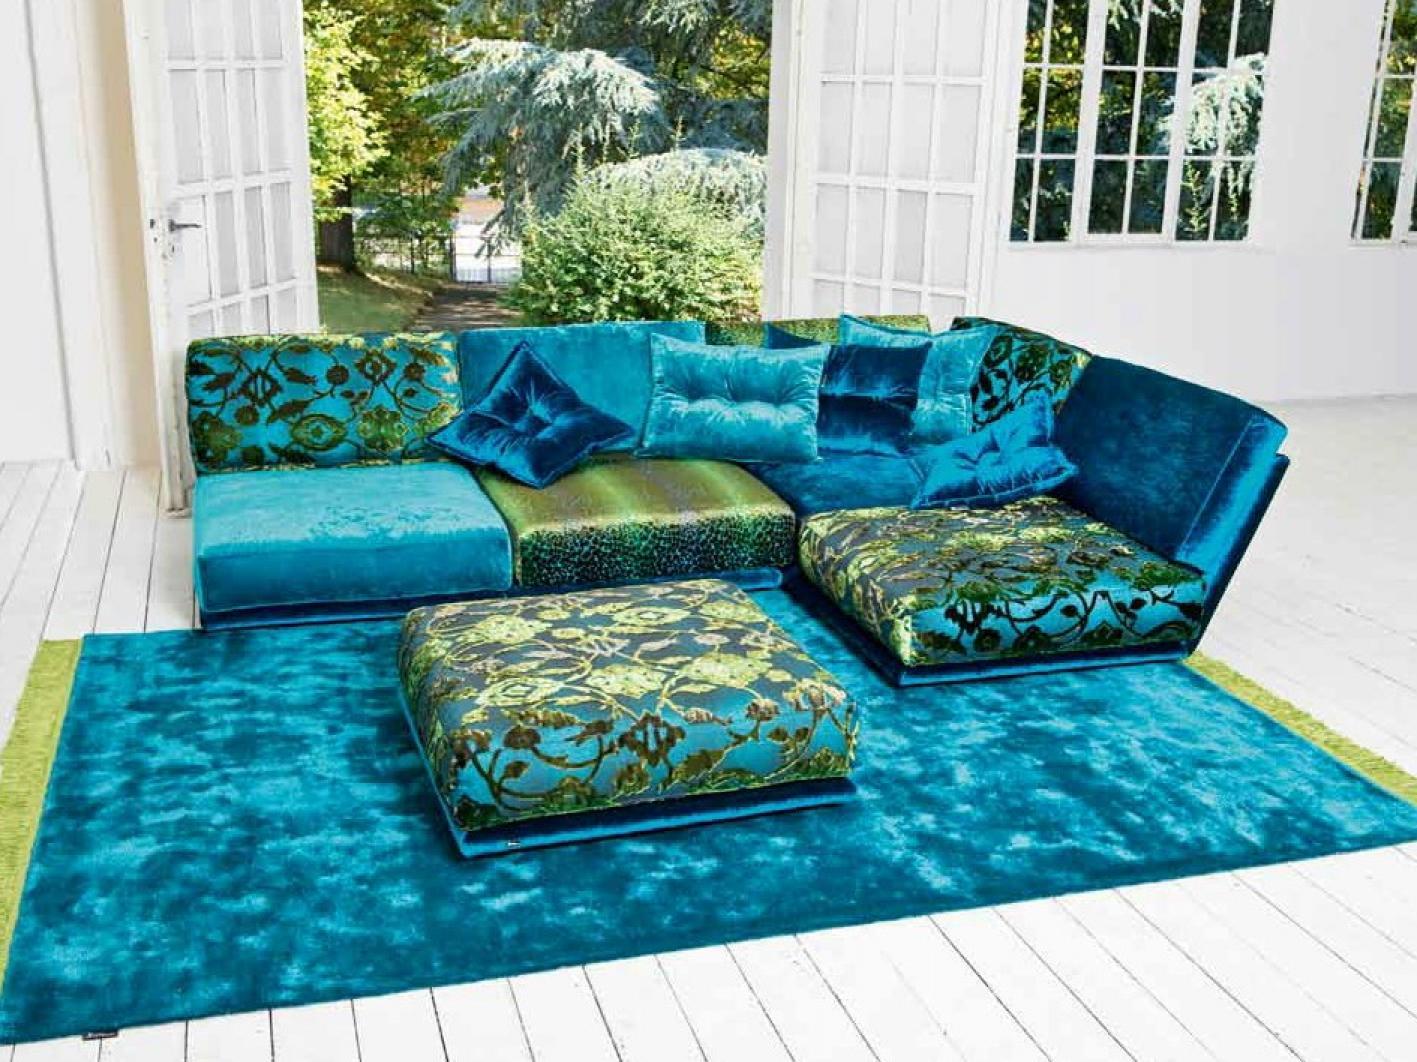 photos canap bretz occasion. Black Bedroom Furniture Sets. Home Design Ideas